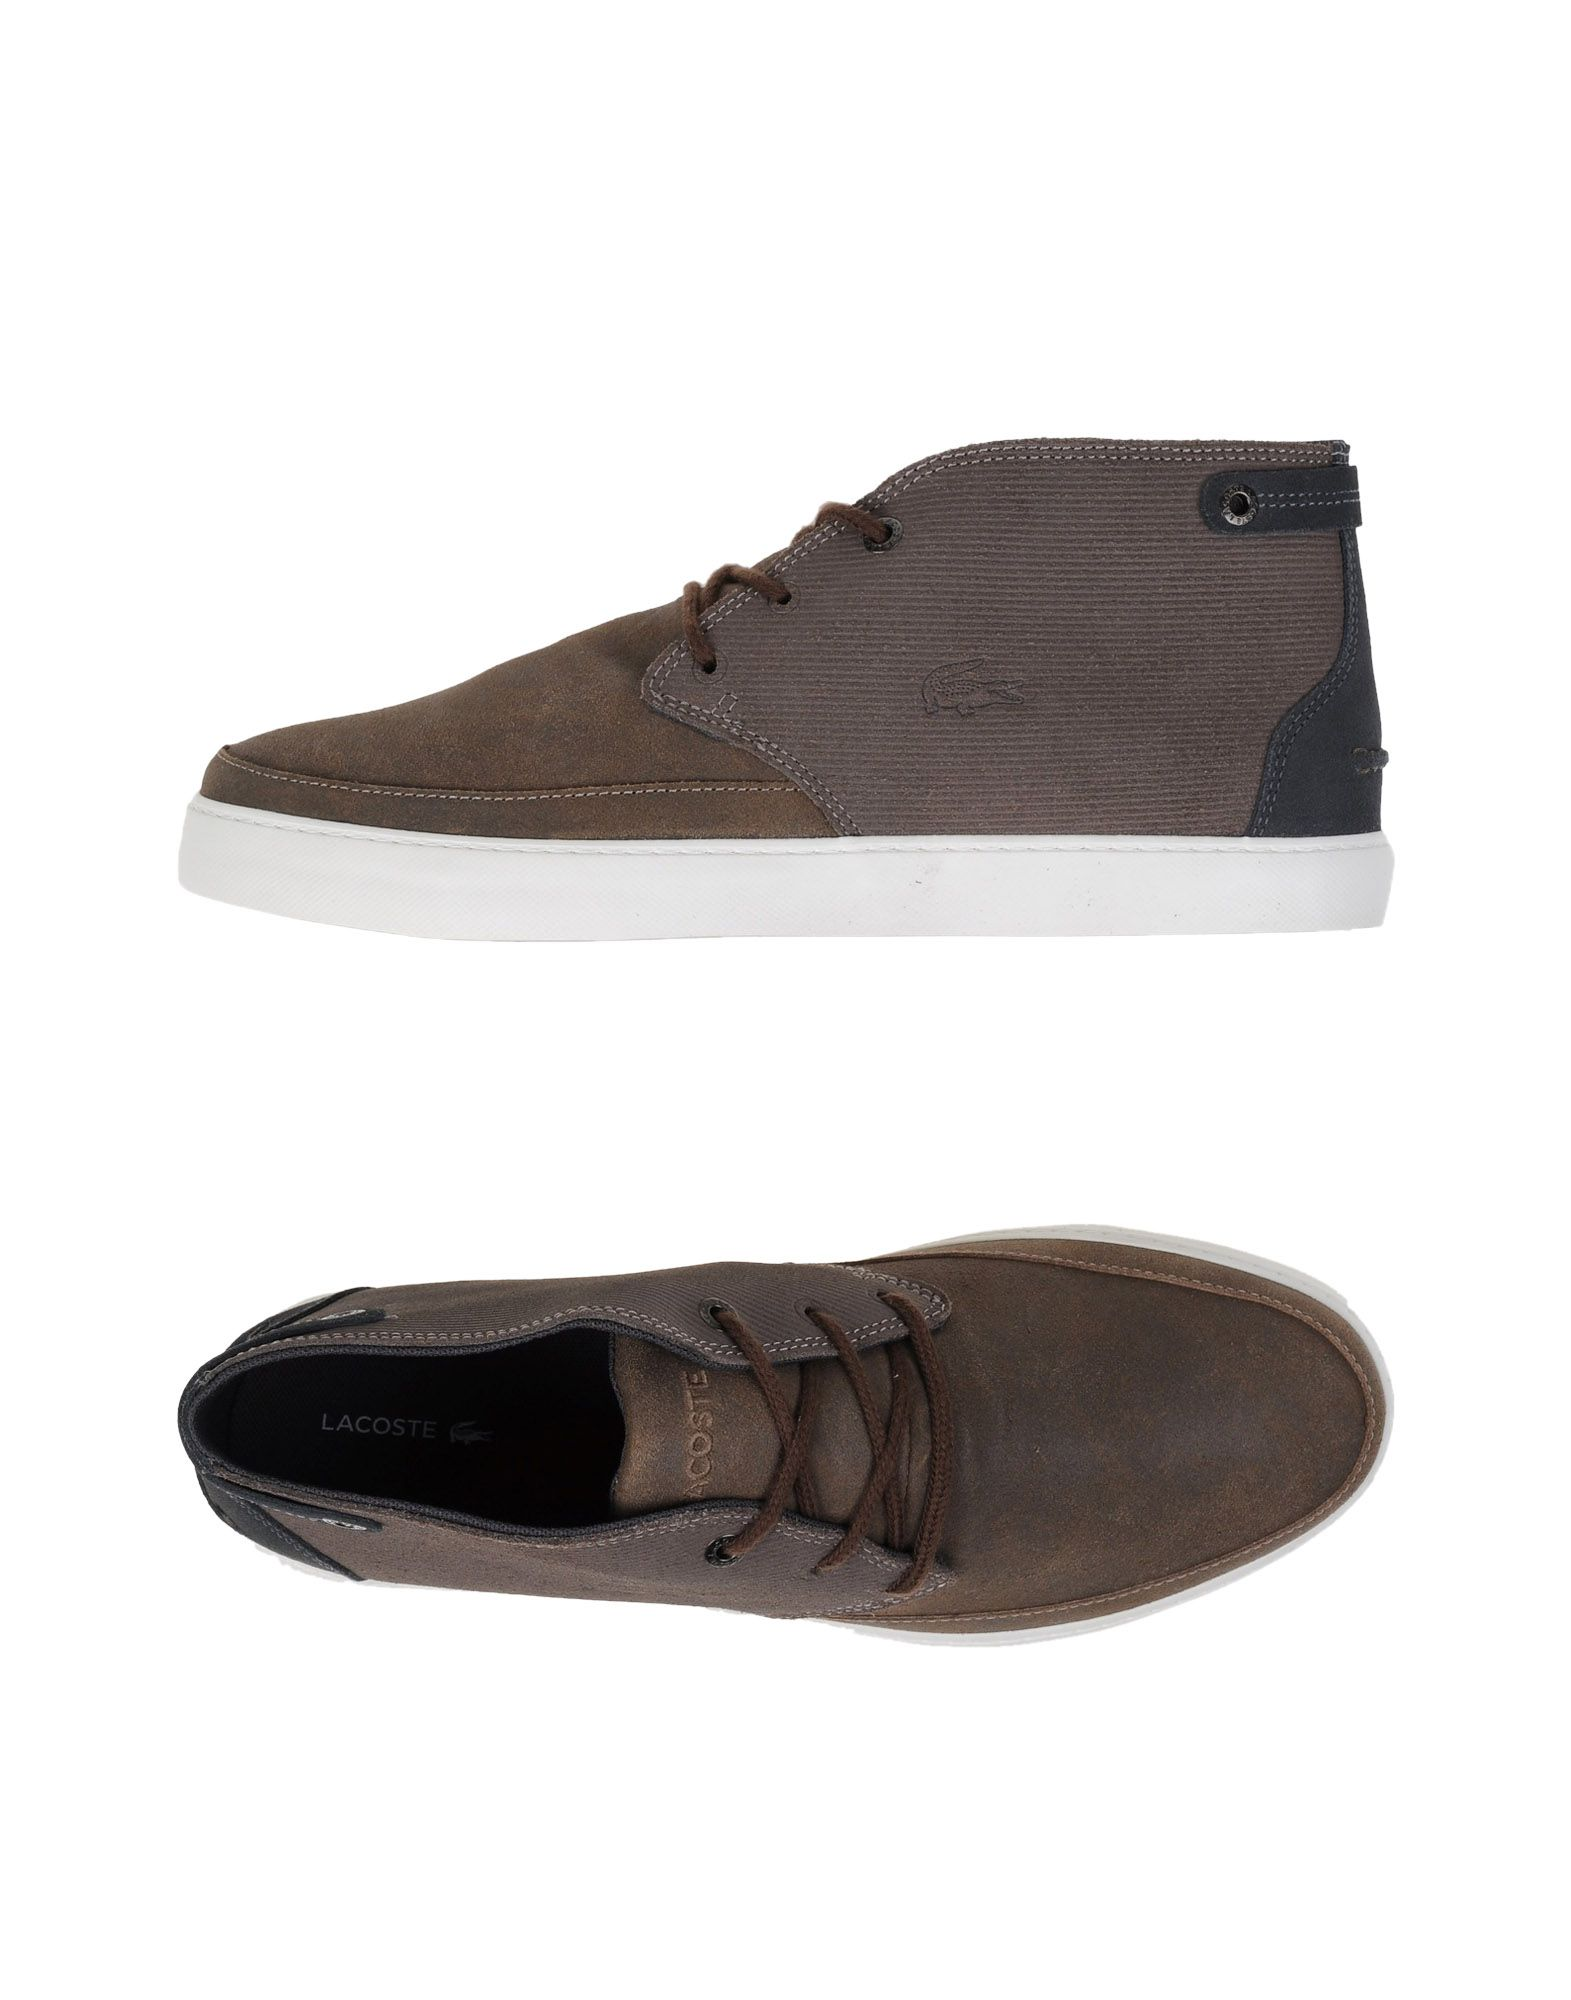 Rabatt 11106944HQ echte Schuhe Lacoste Clavel M 316 1  11106944HQ Rabatt dbf12e